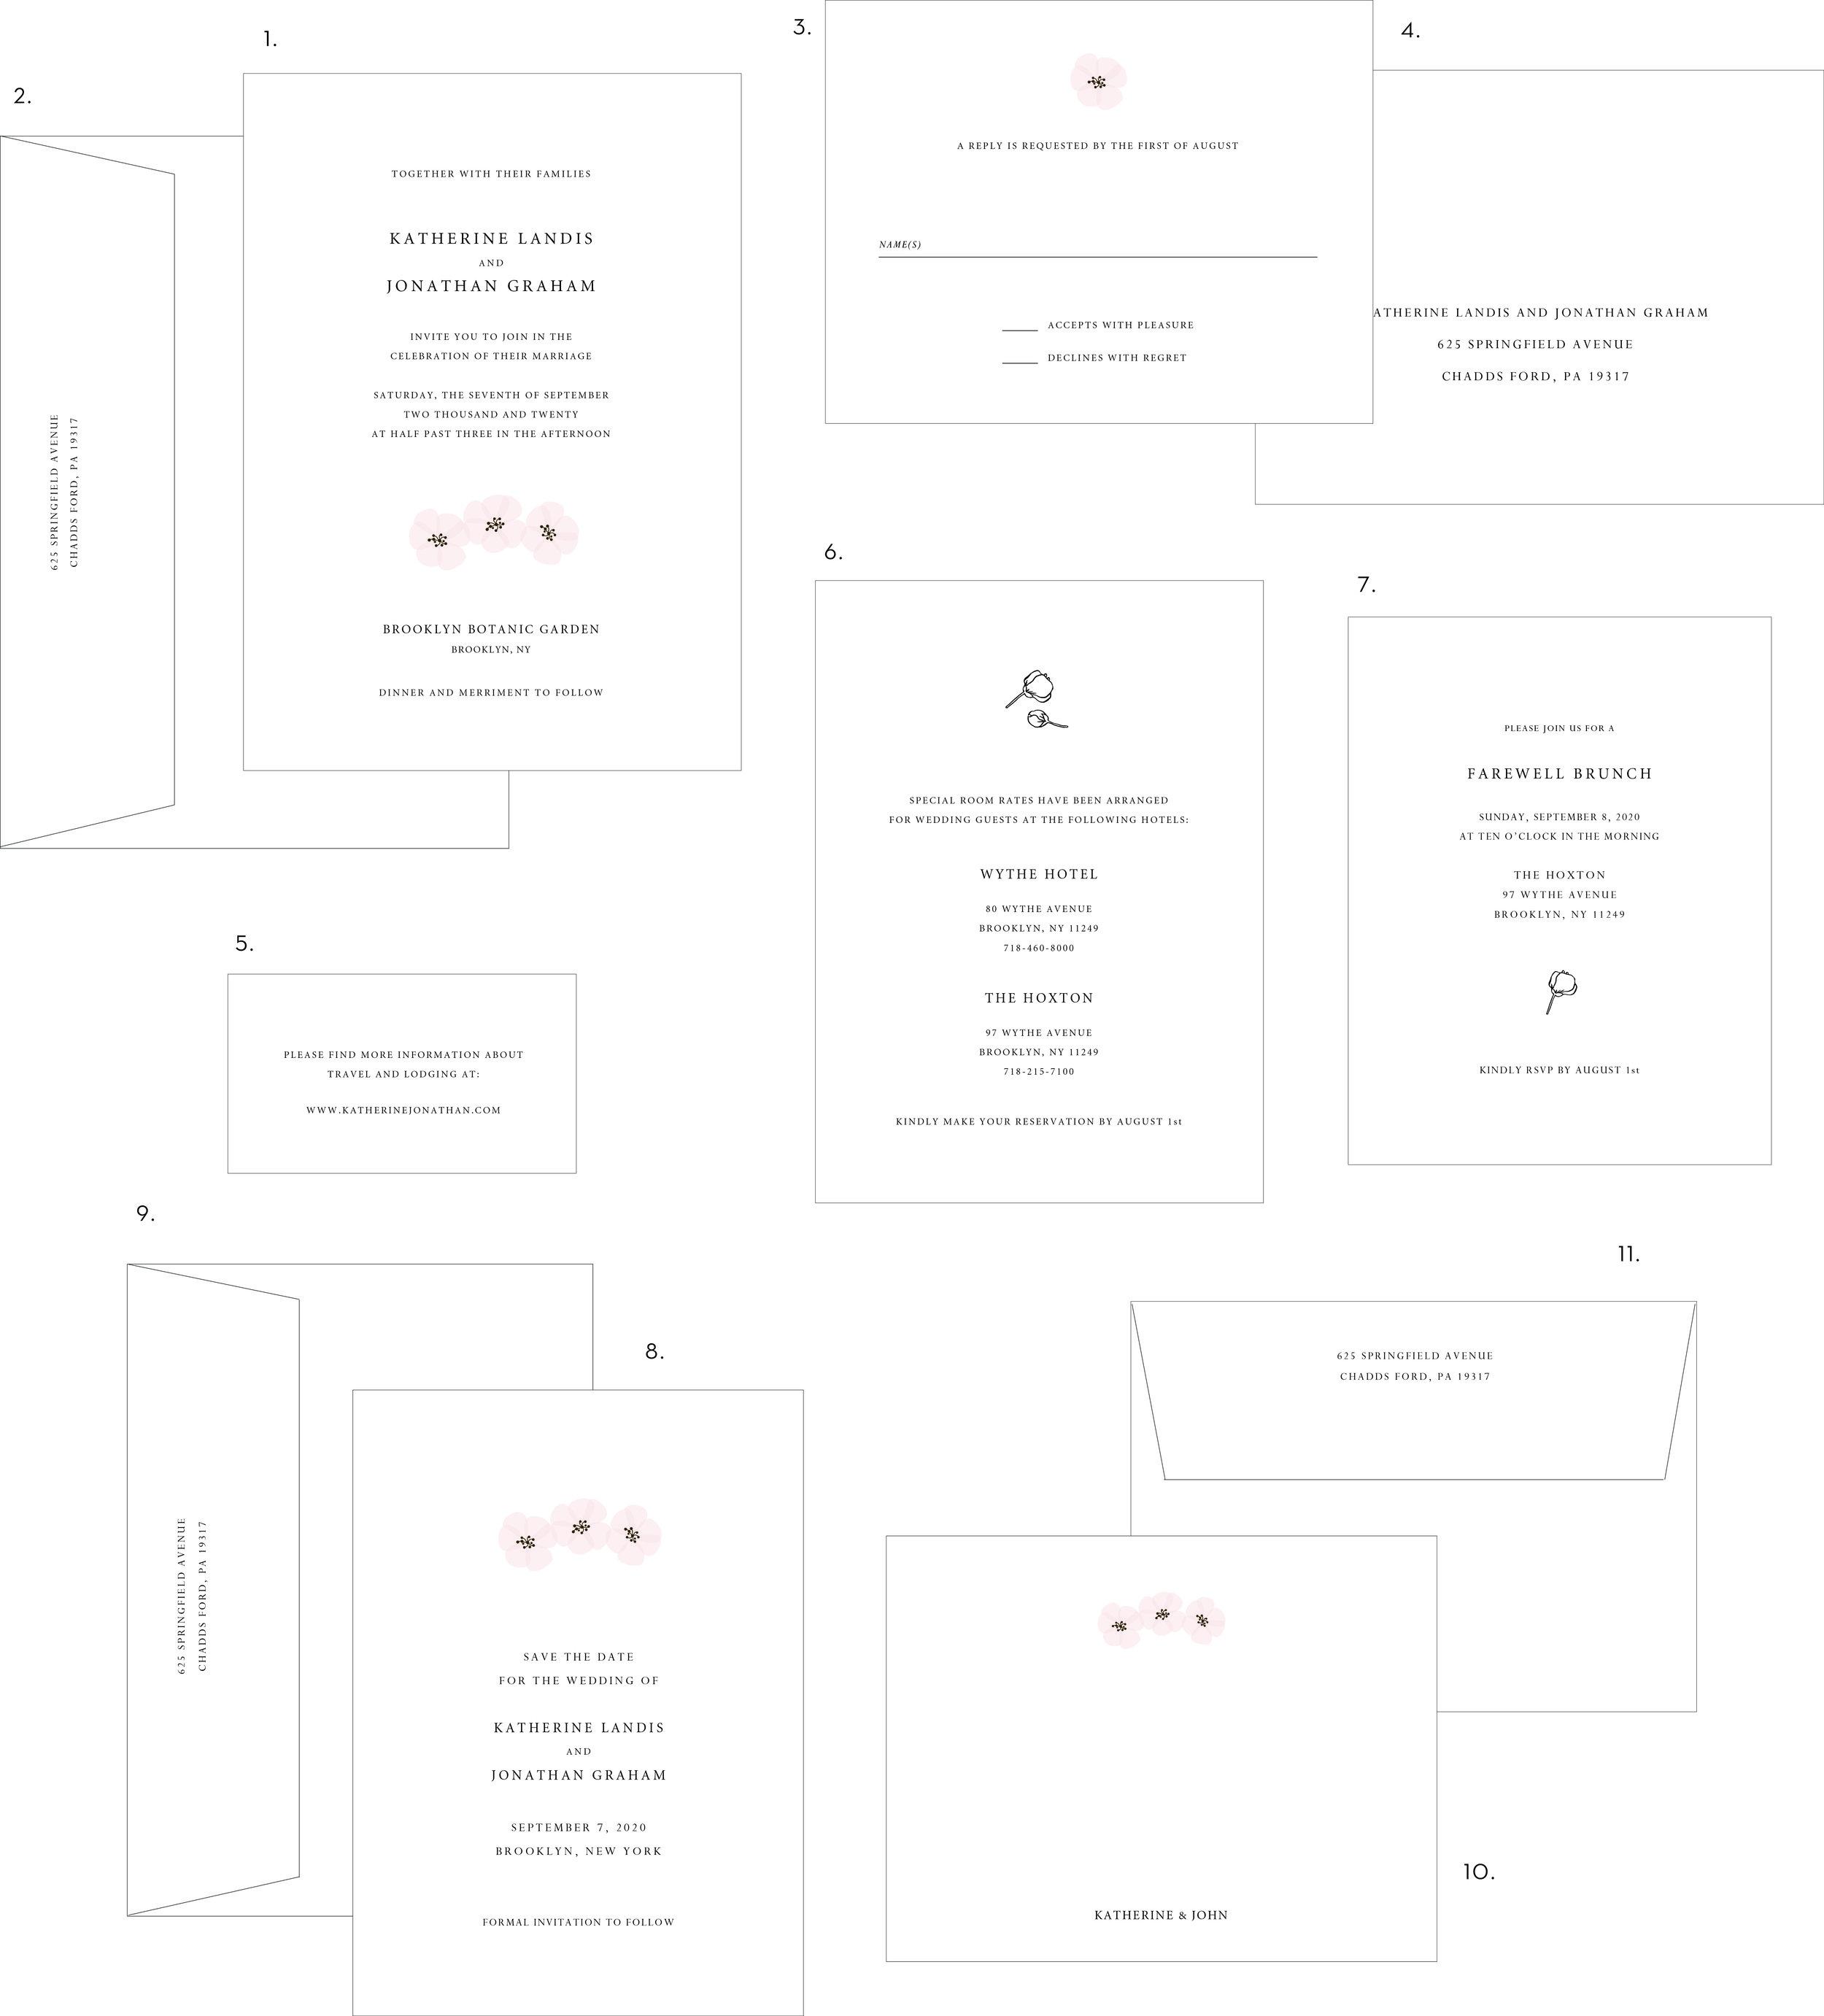 Letterpress Wedding Invitation Cherry Blossom Style.jpg